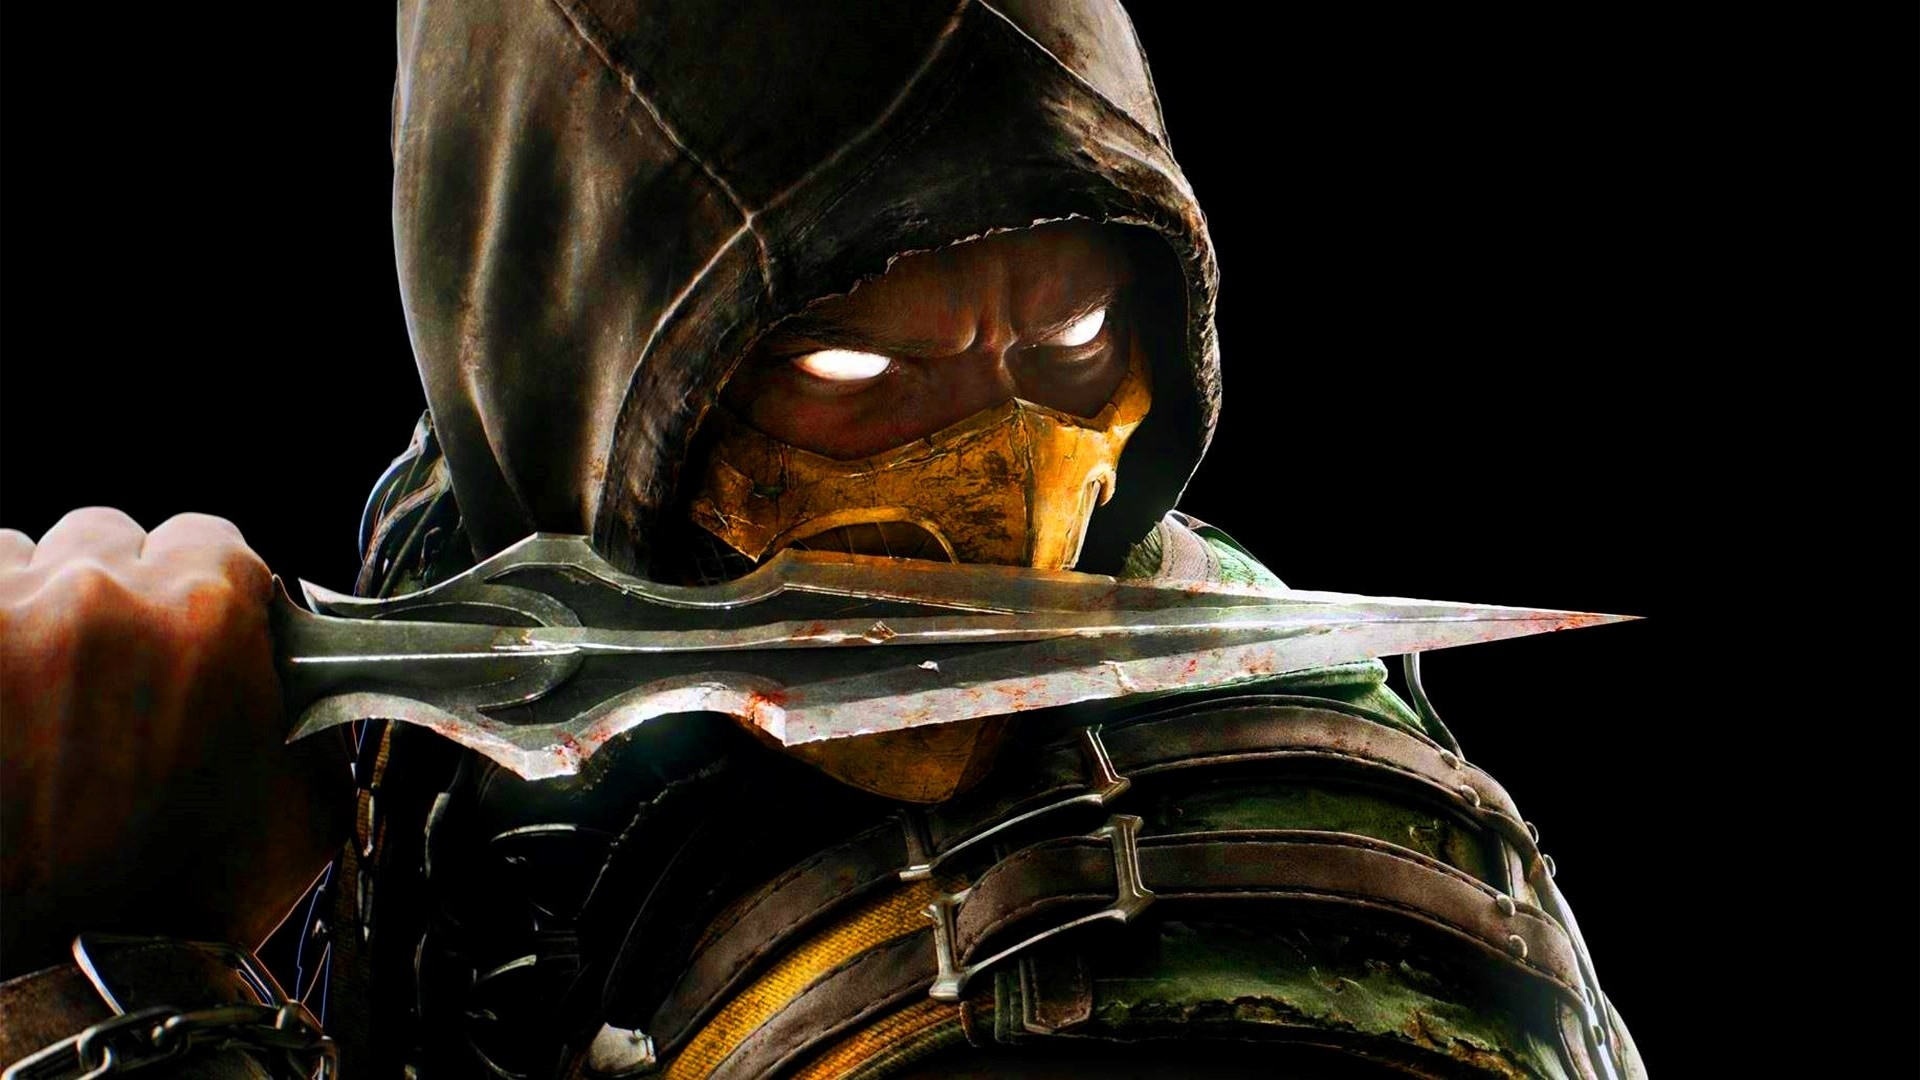 Mortal Kombat X Scorpion With Knife   1920 x 1080   Download   Close